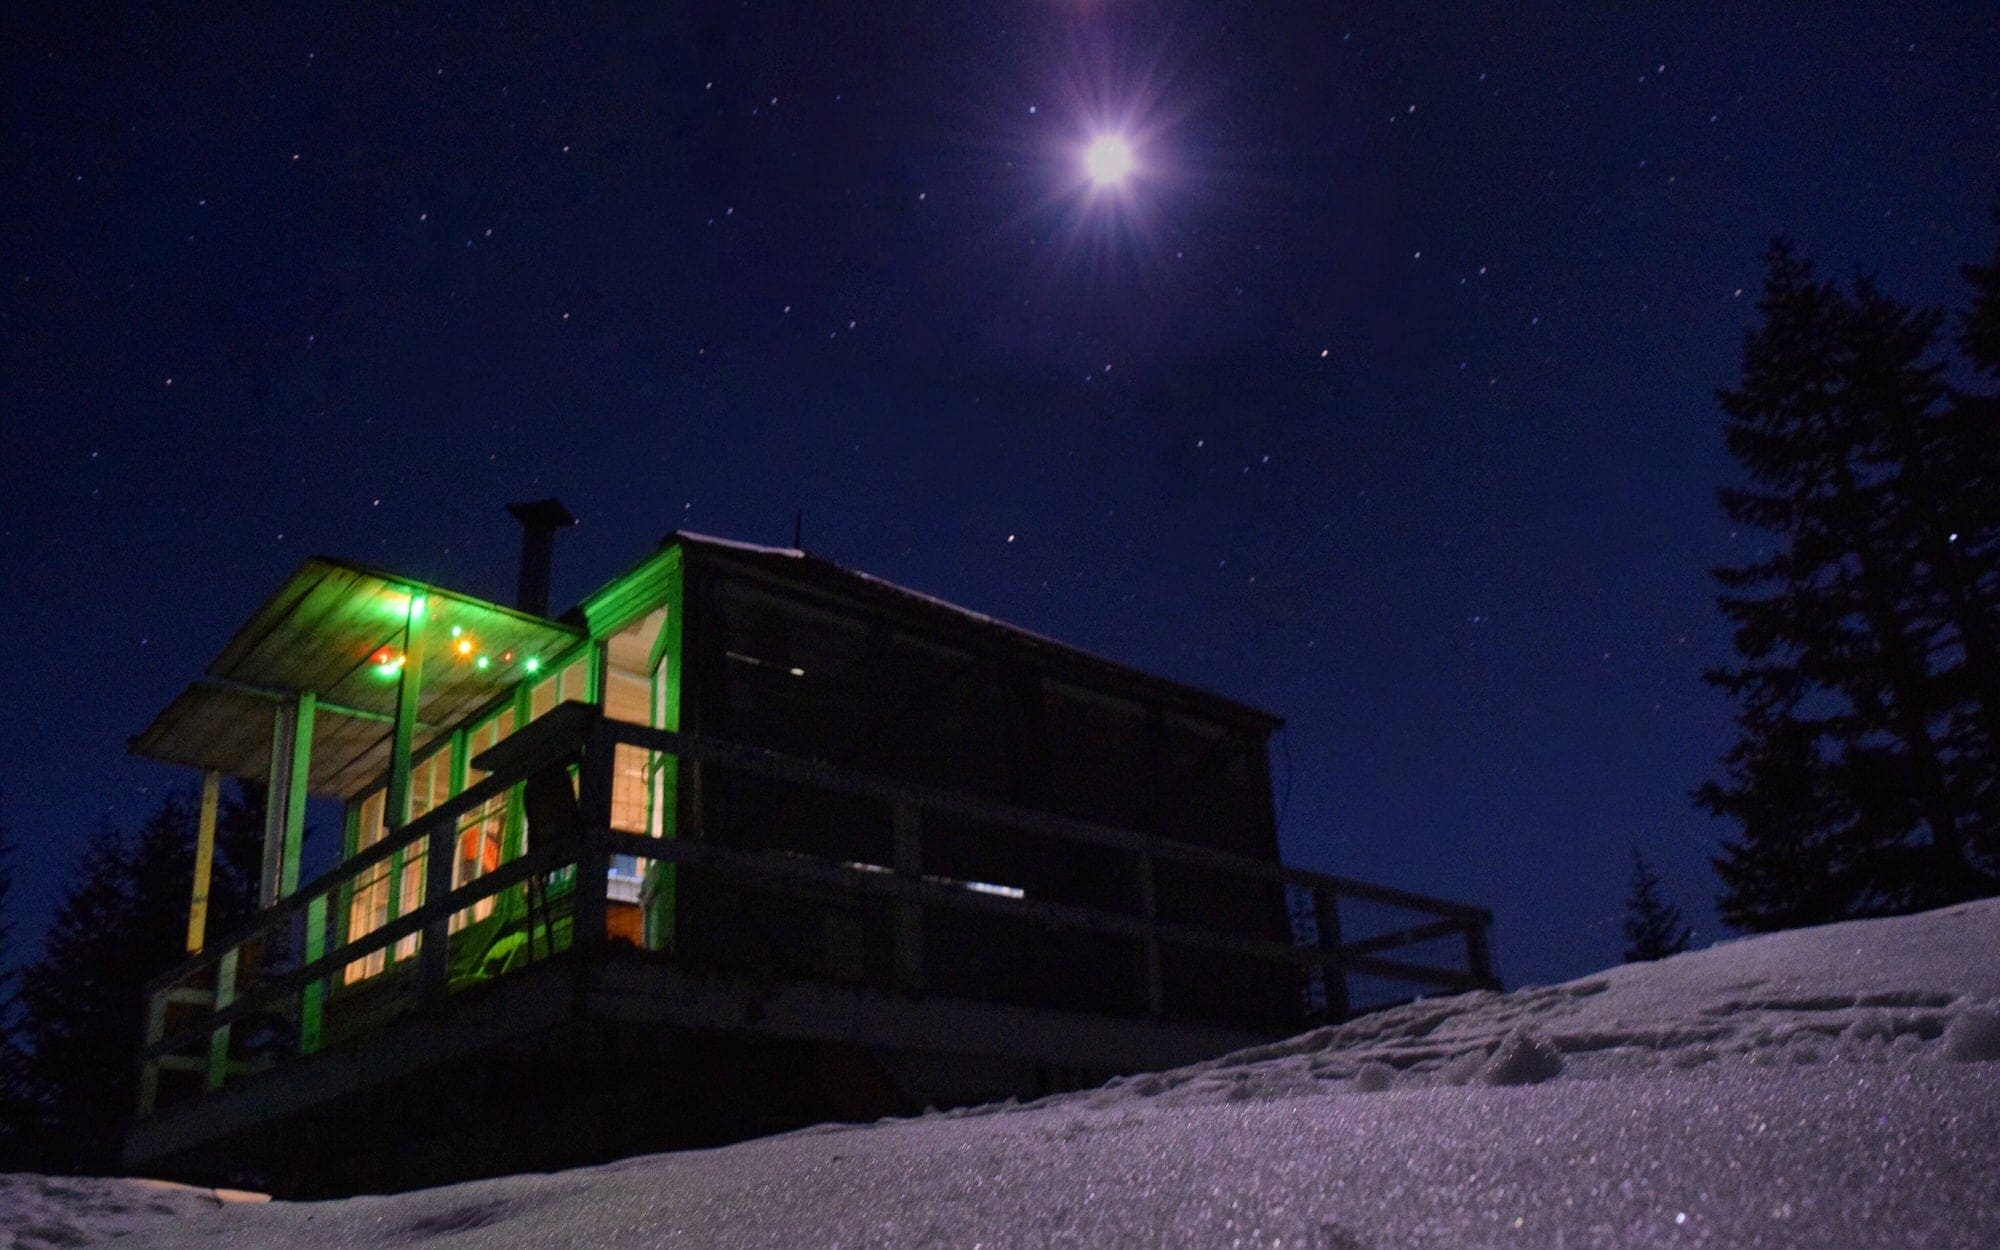 Devil's Peak lookout at night